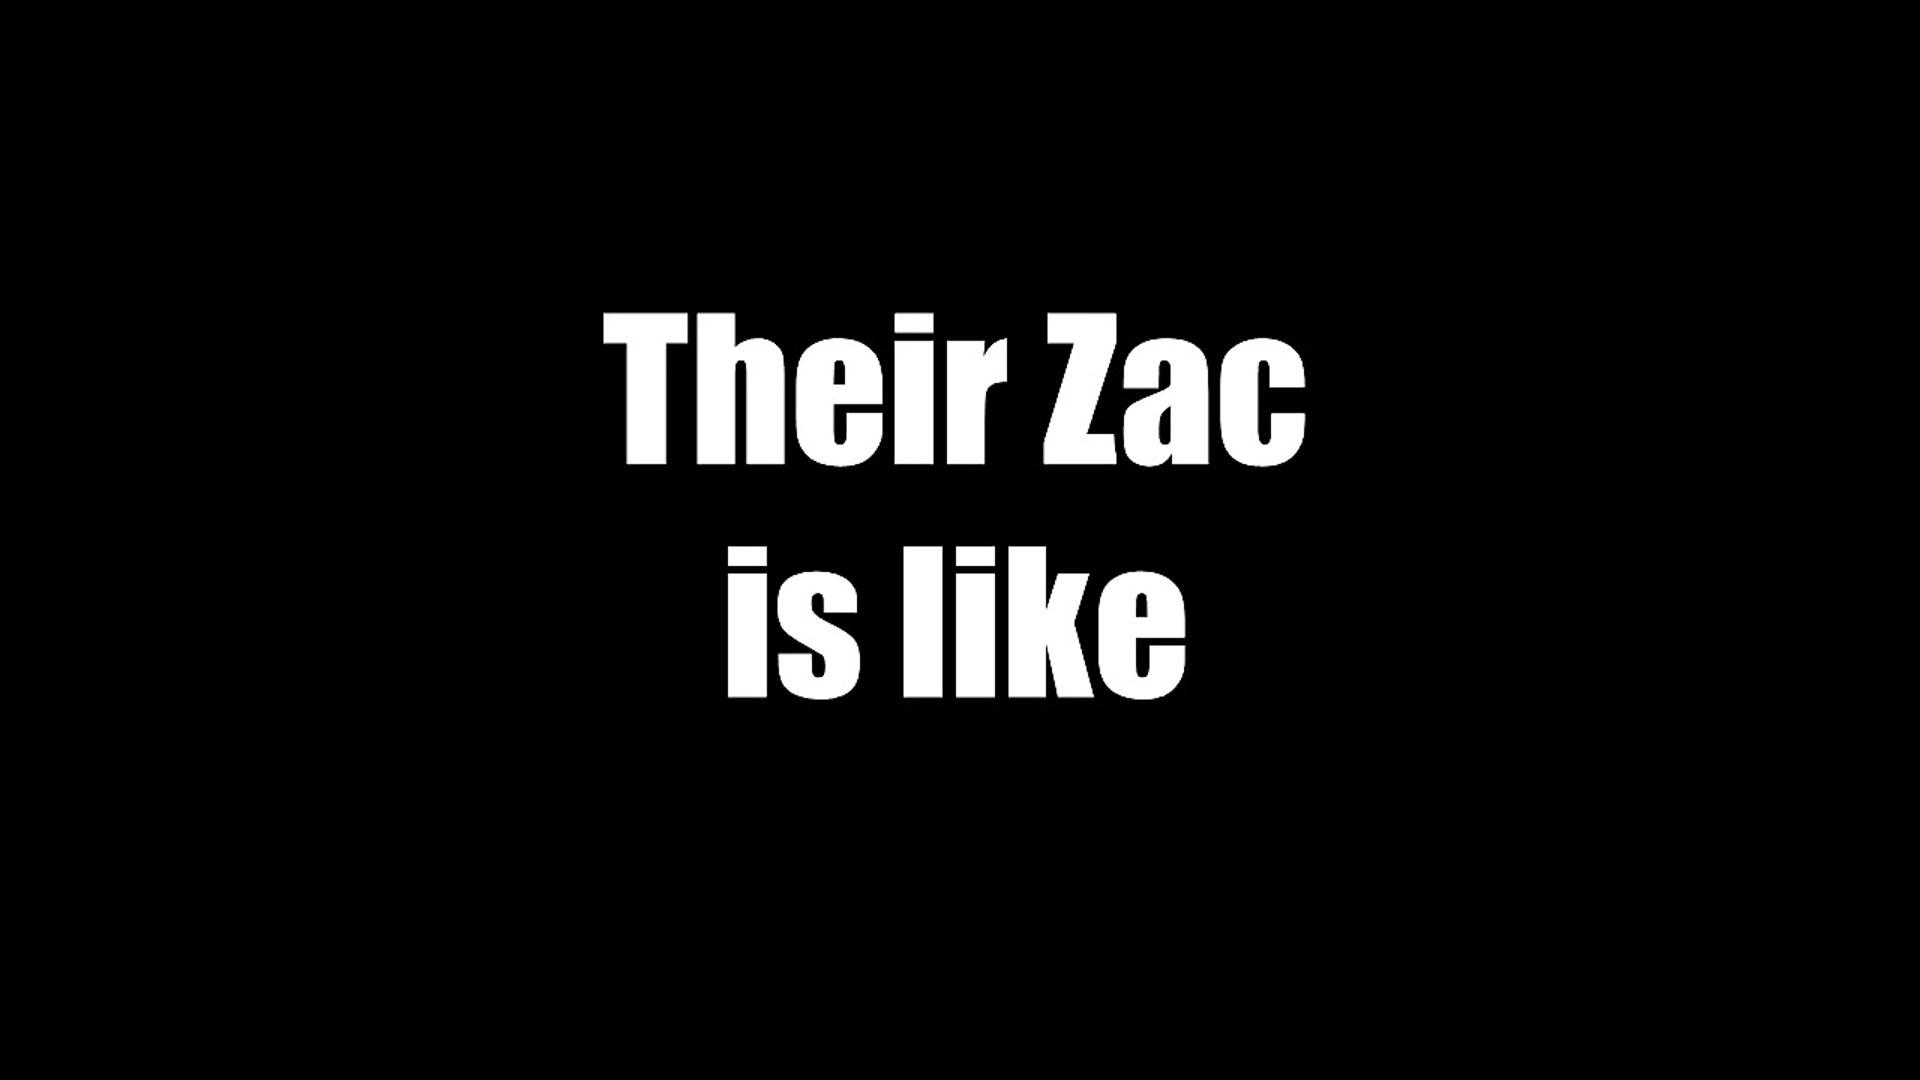 Their Zac vs Our Zac [LEAGUE OF LEGENDS VINE]